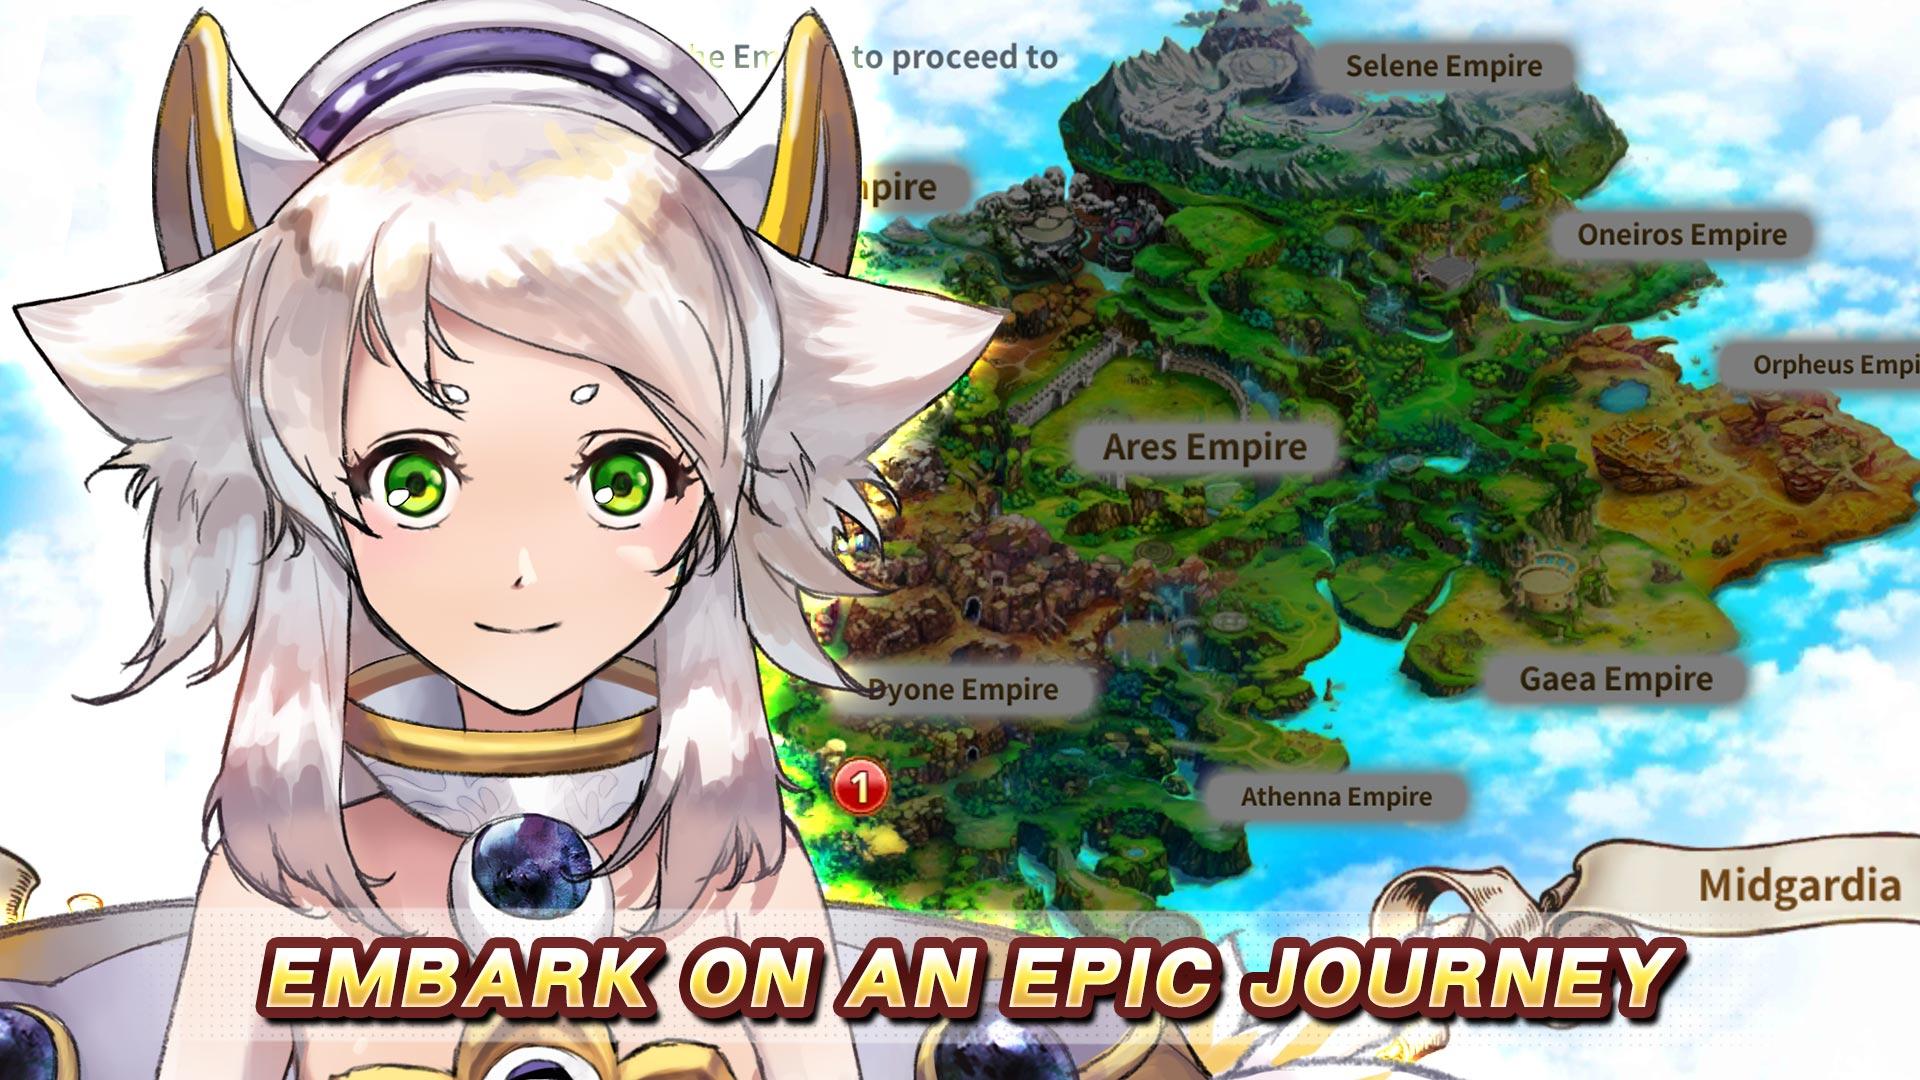 action-adventure Game - Sacred Sword Princesses